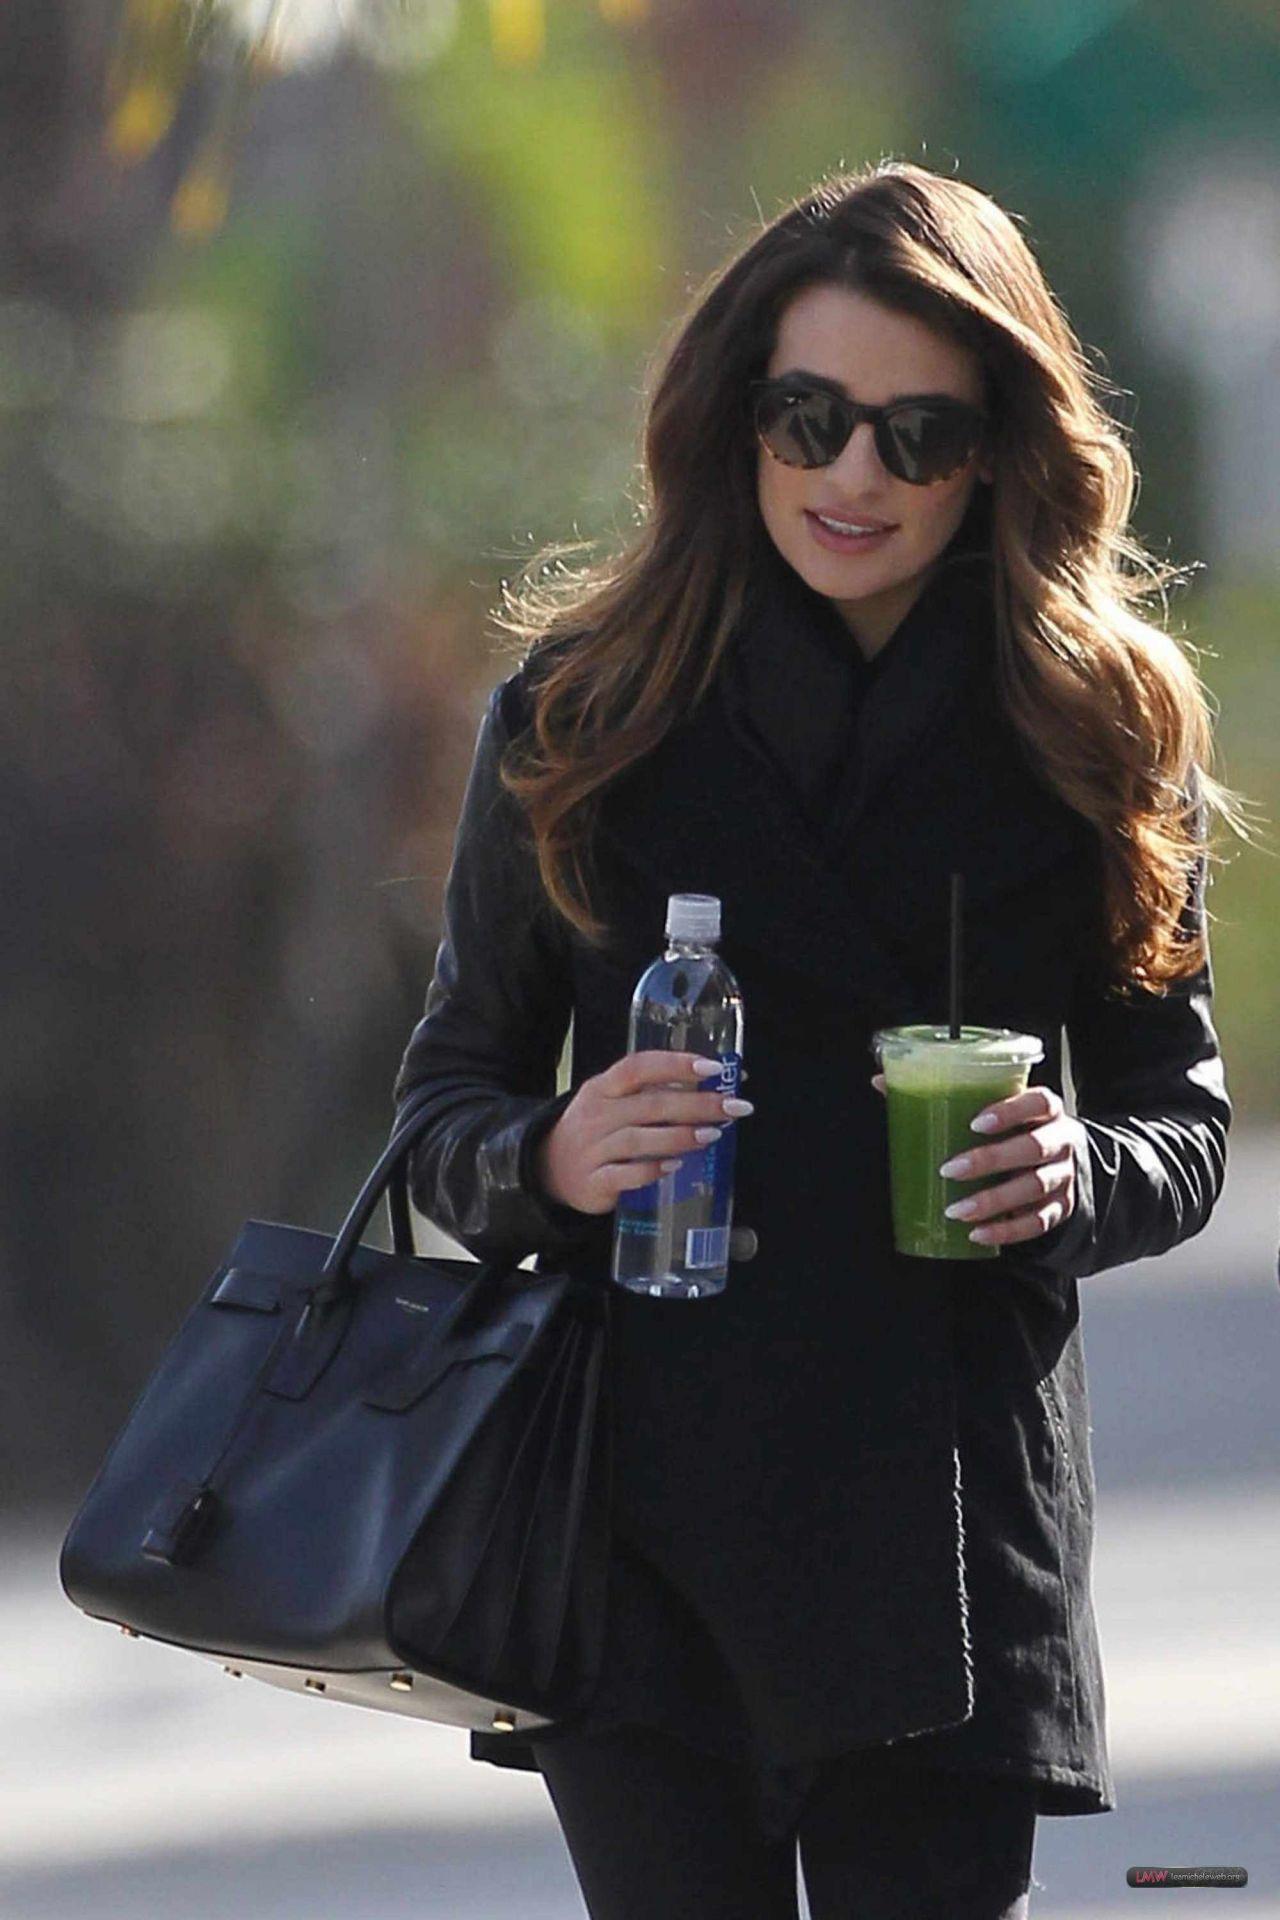 Lea Michele Street Style - Leaving Studio in W. Hollywood - December 2013